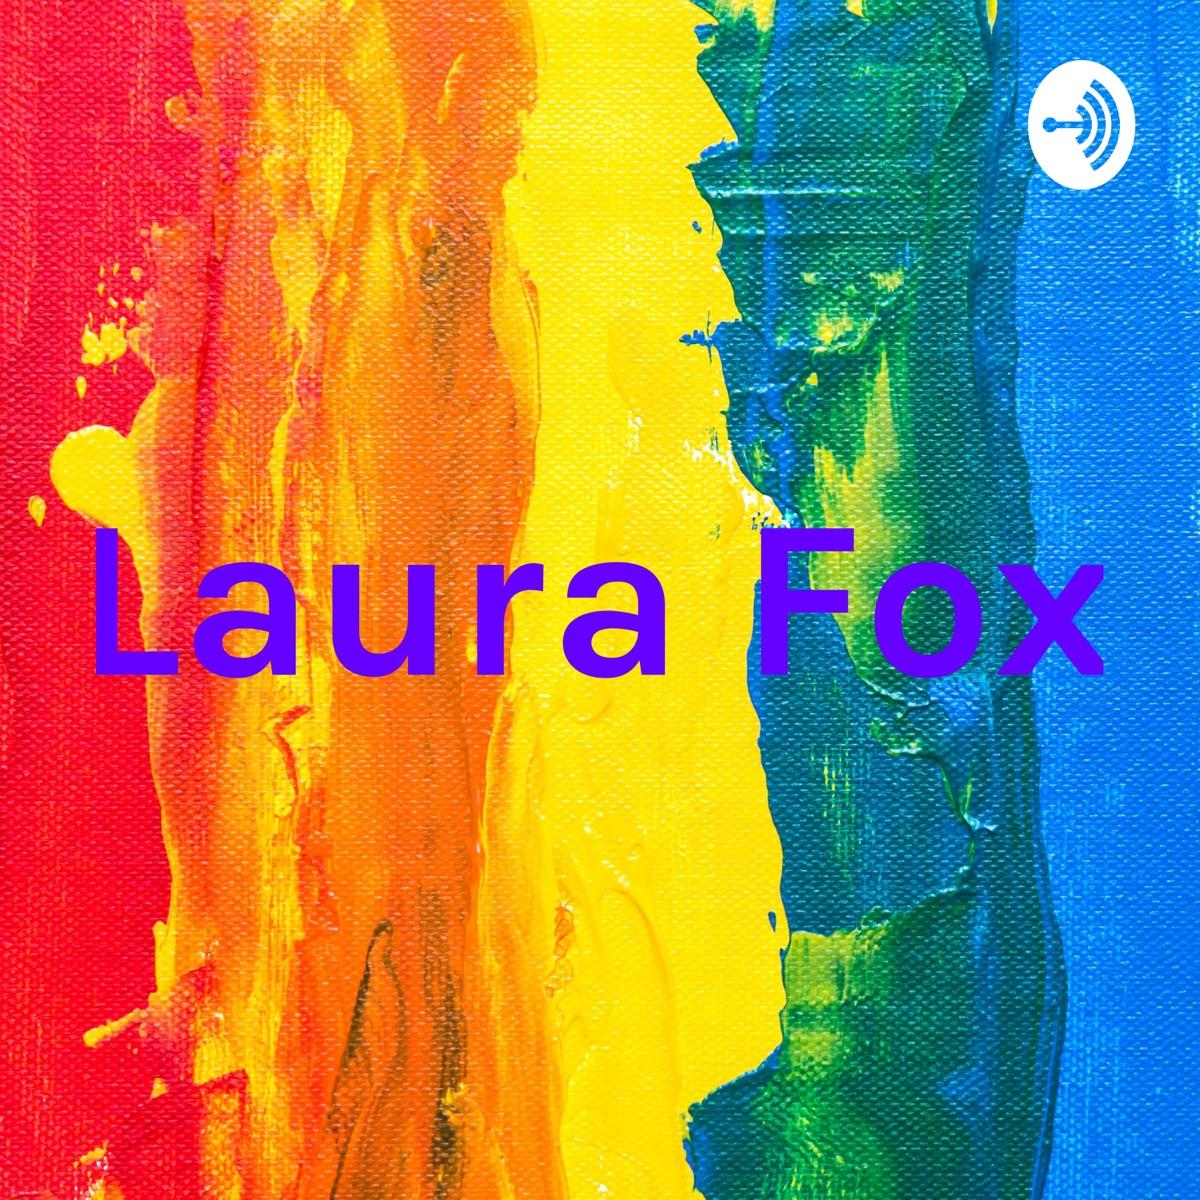 Laura Fox